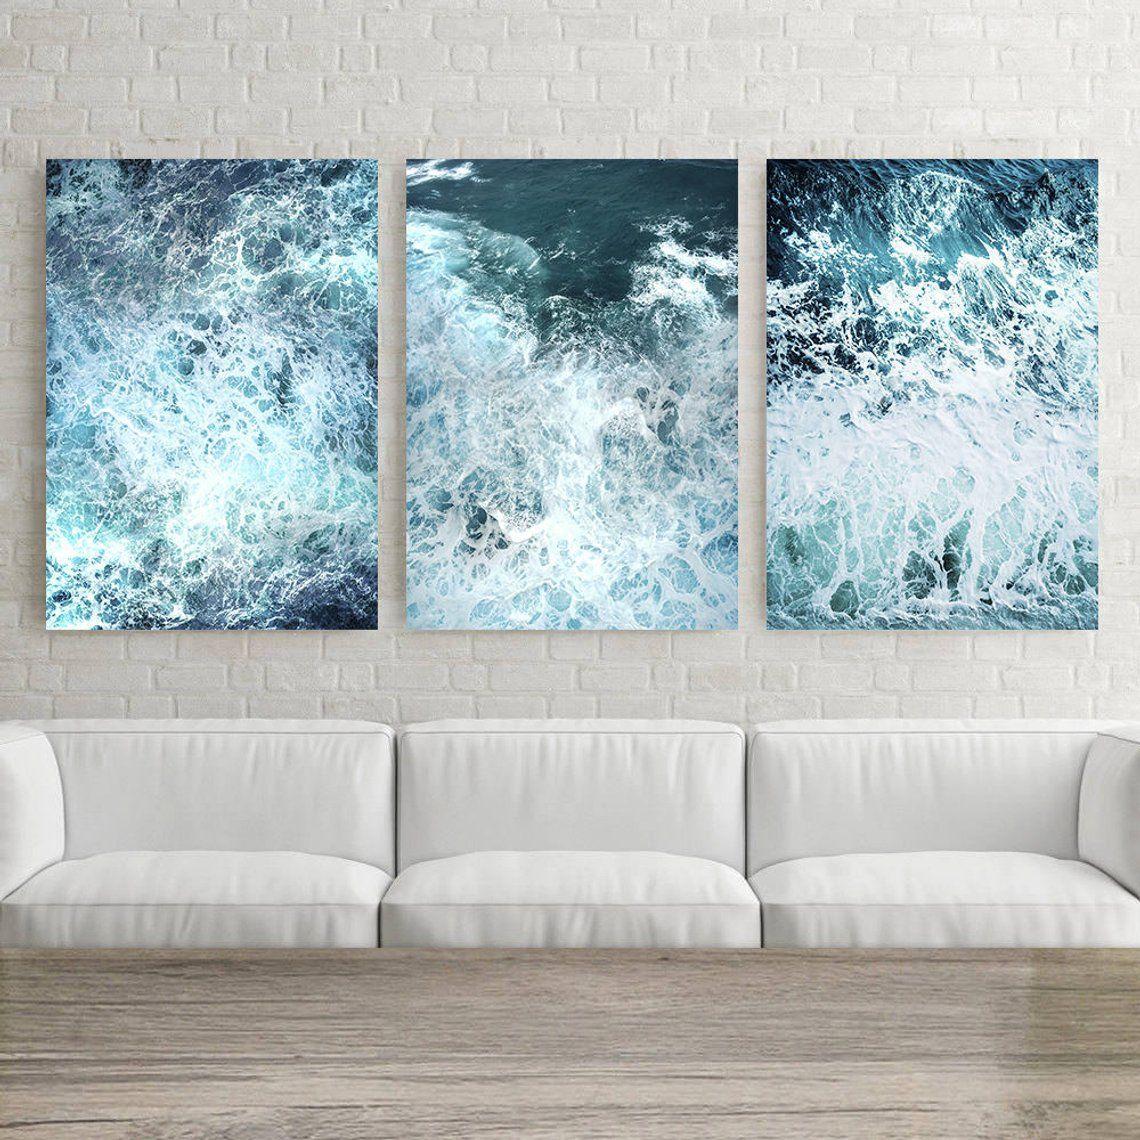 Ocean Wave Print 3 Piece Wall Art Ocean Poster Decor 3 Etsy In 2021 3 Piece Wall Art Ocean Wall Art Wave Print